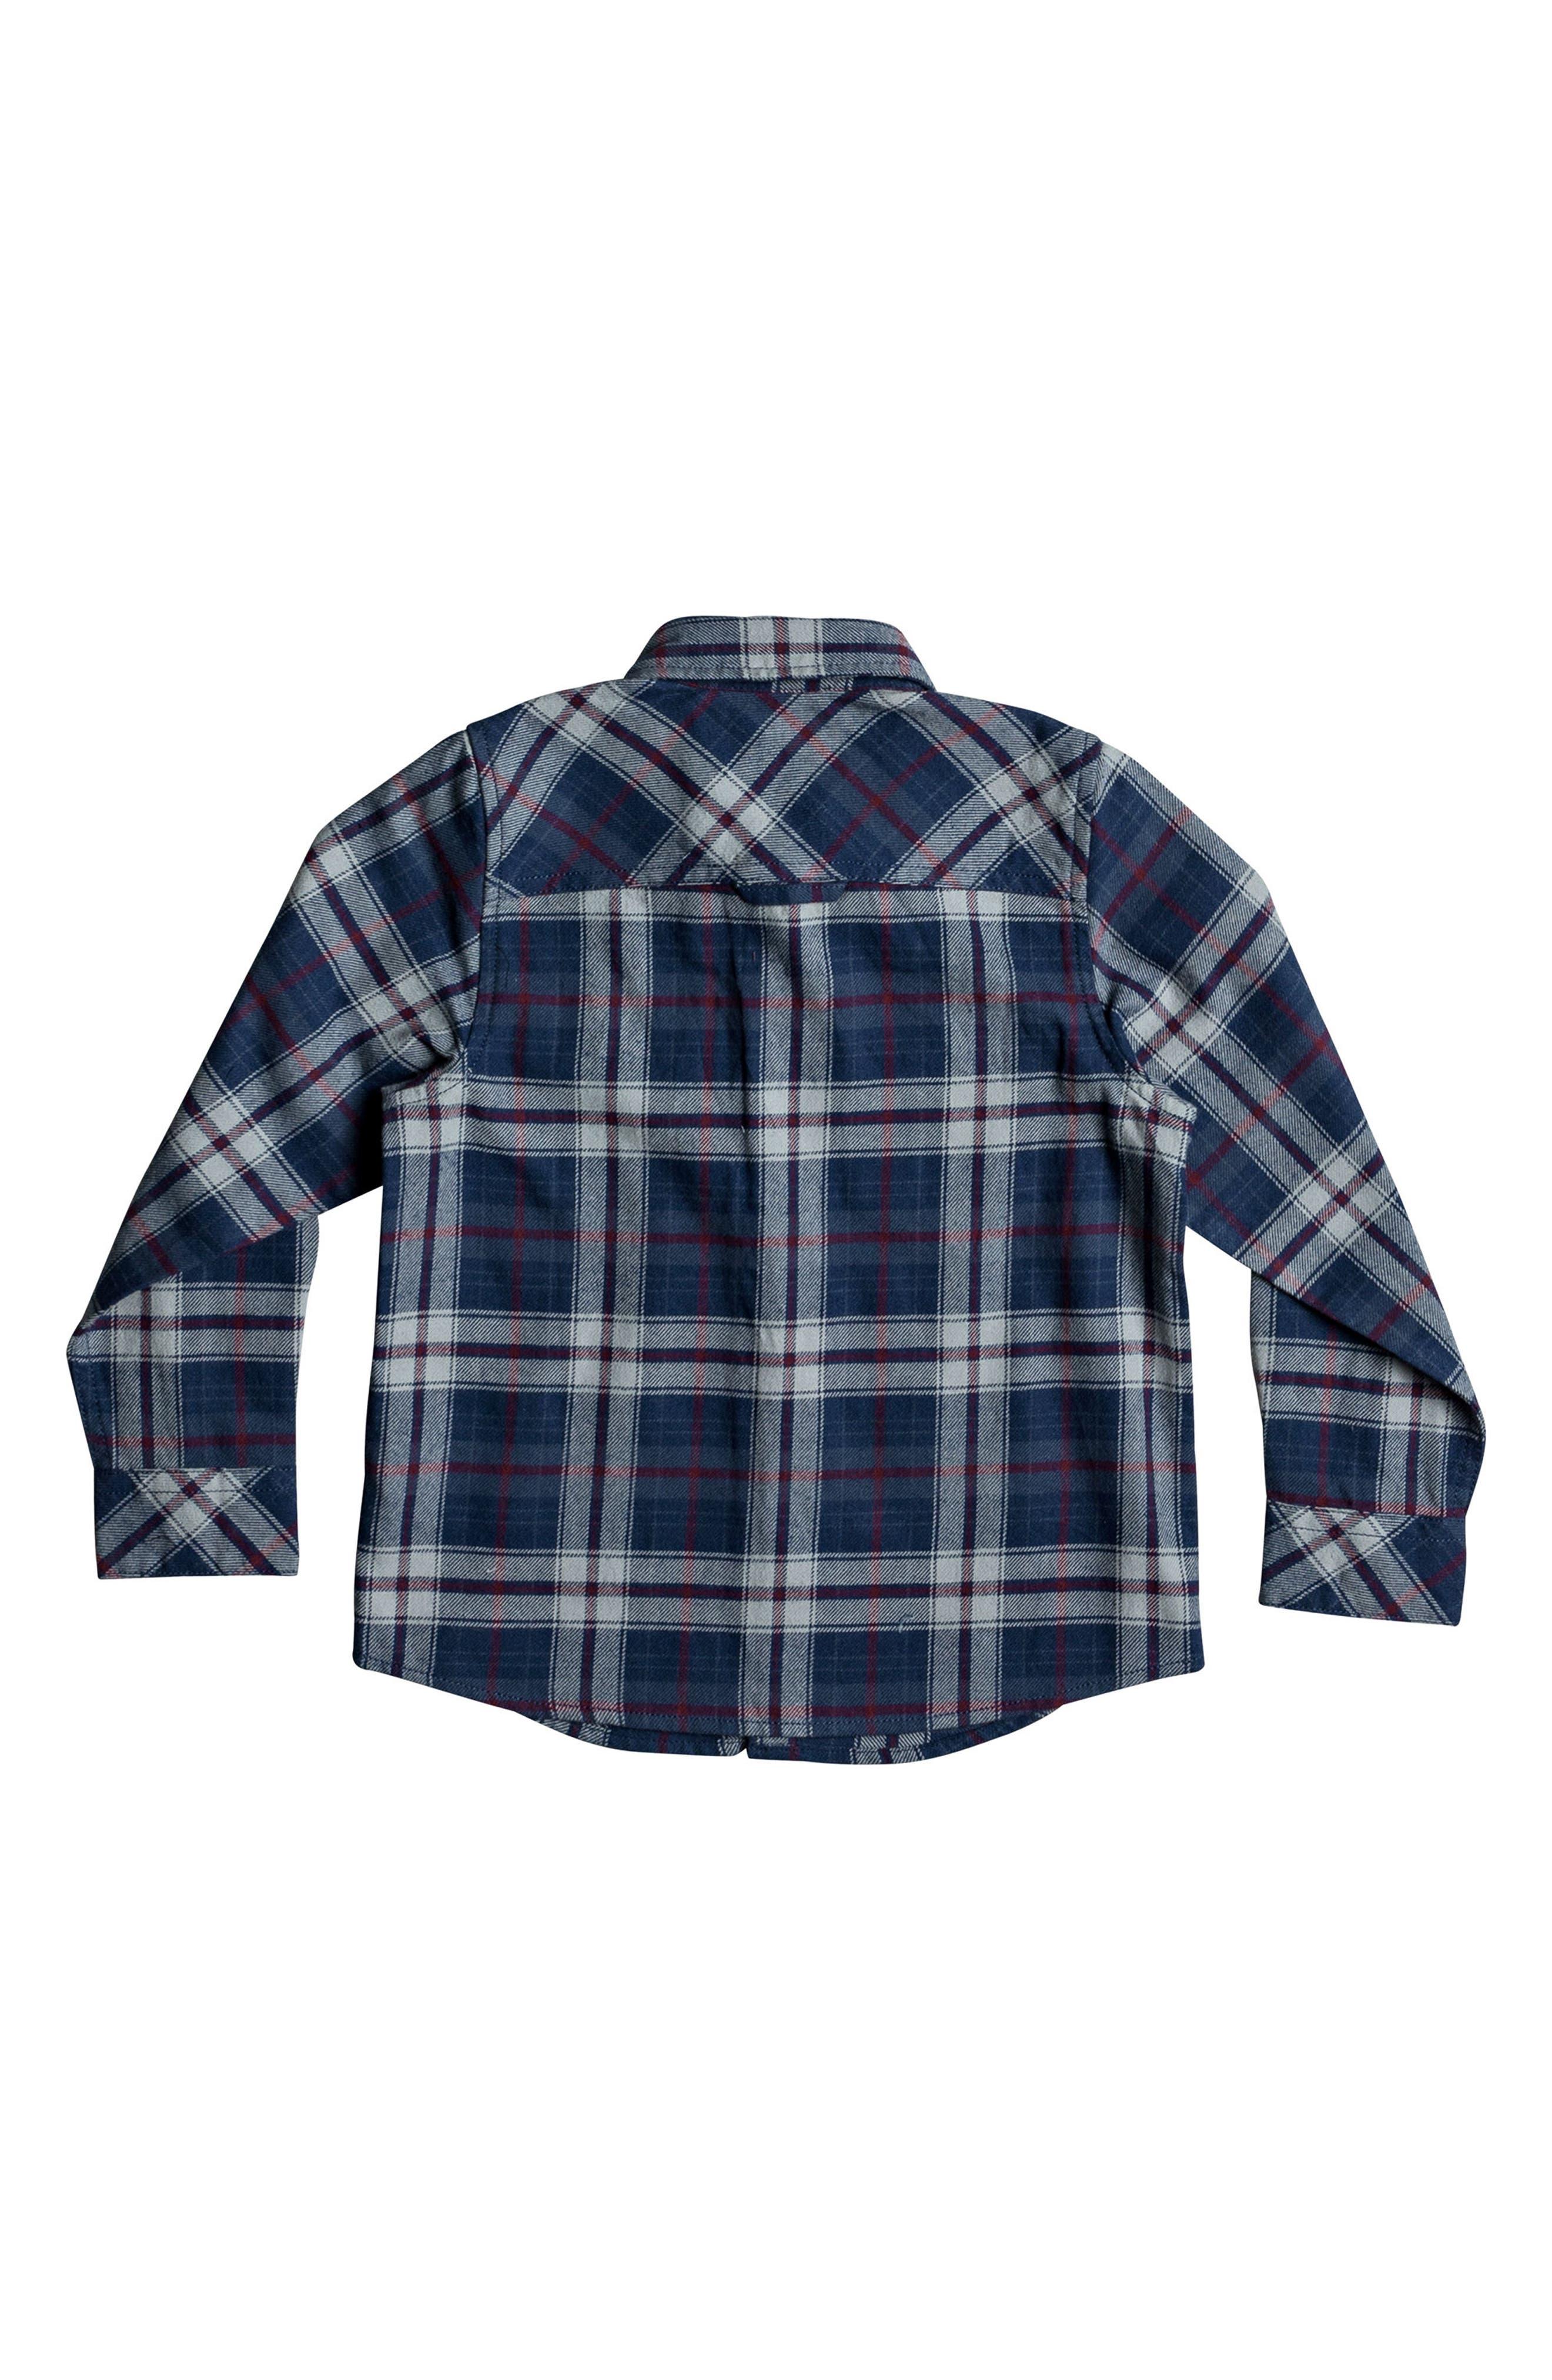 Alternate Image 2  - Quiksilver Fitzspeere Plaid Flannel Shirt (Toddler Boys & Little Boys)